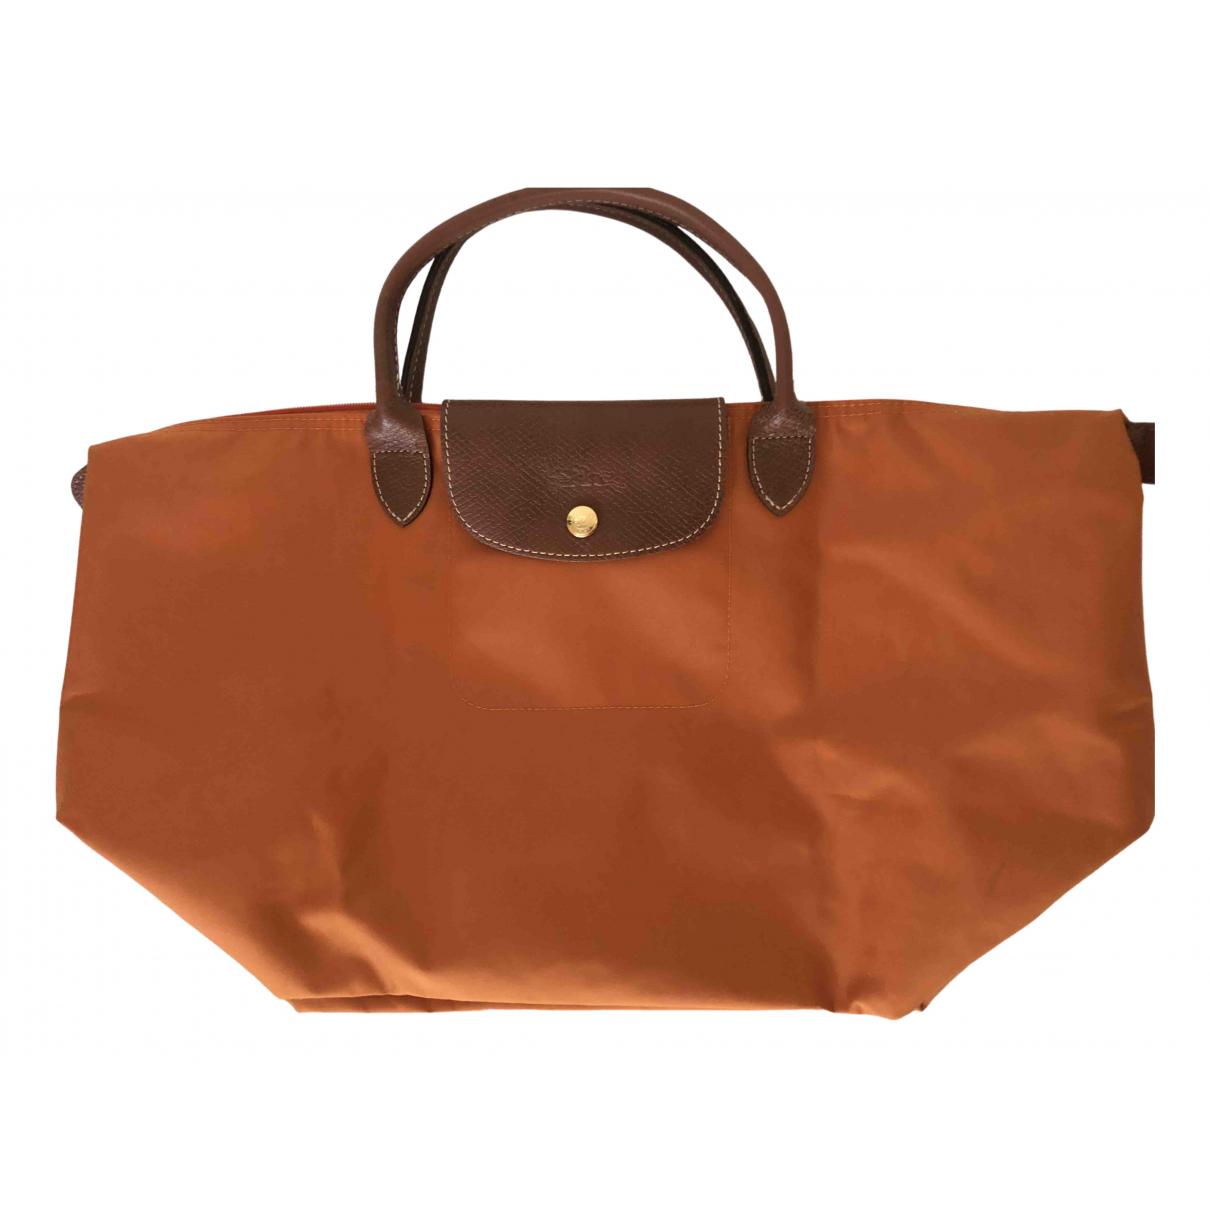 Longchamp - Sac a main Pliage  pour femme en toile - orange